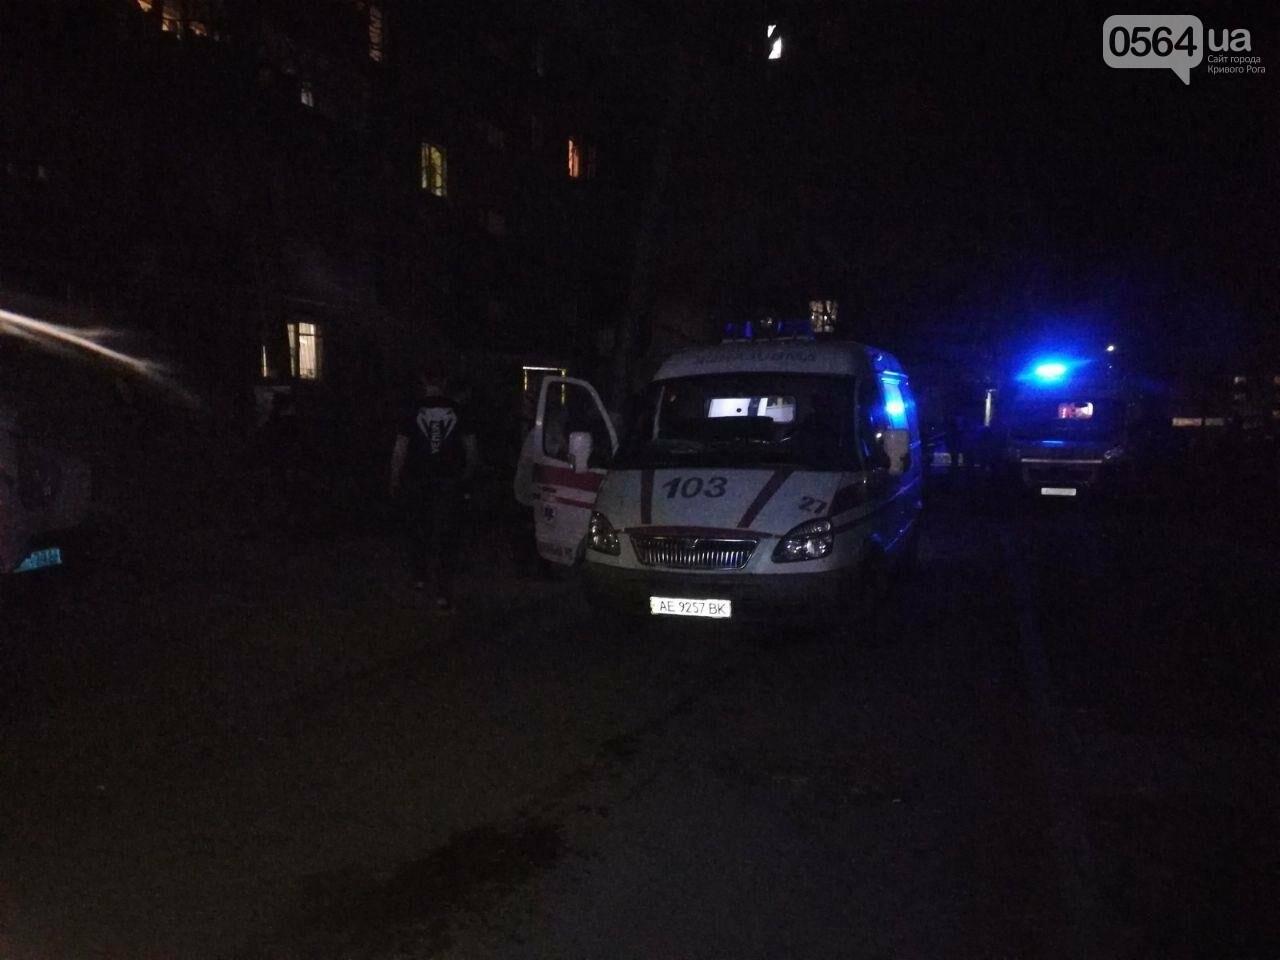 В Кривом Роге загорелась квартира на 6 этаже. Найдено тело мужчины, - ФОТО 18+, ВИДЕО, ОБНОВЛЕНО, фото-8